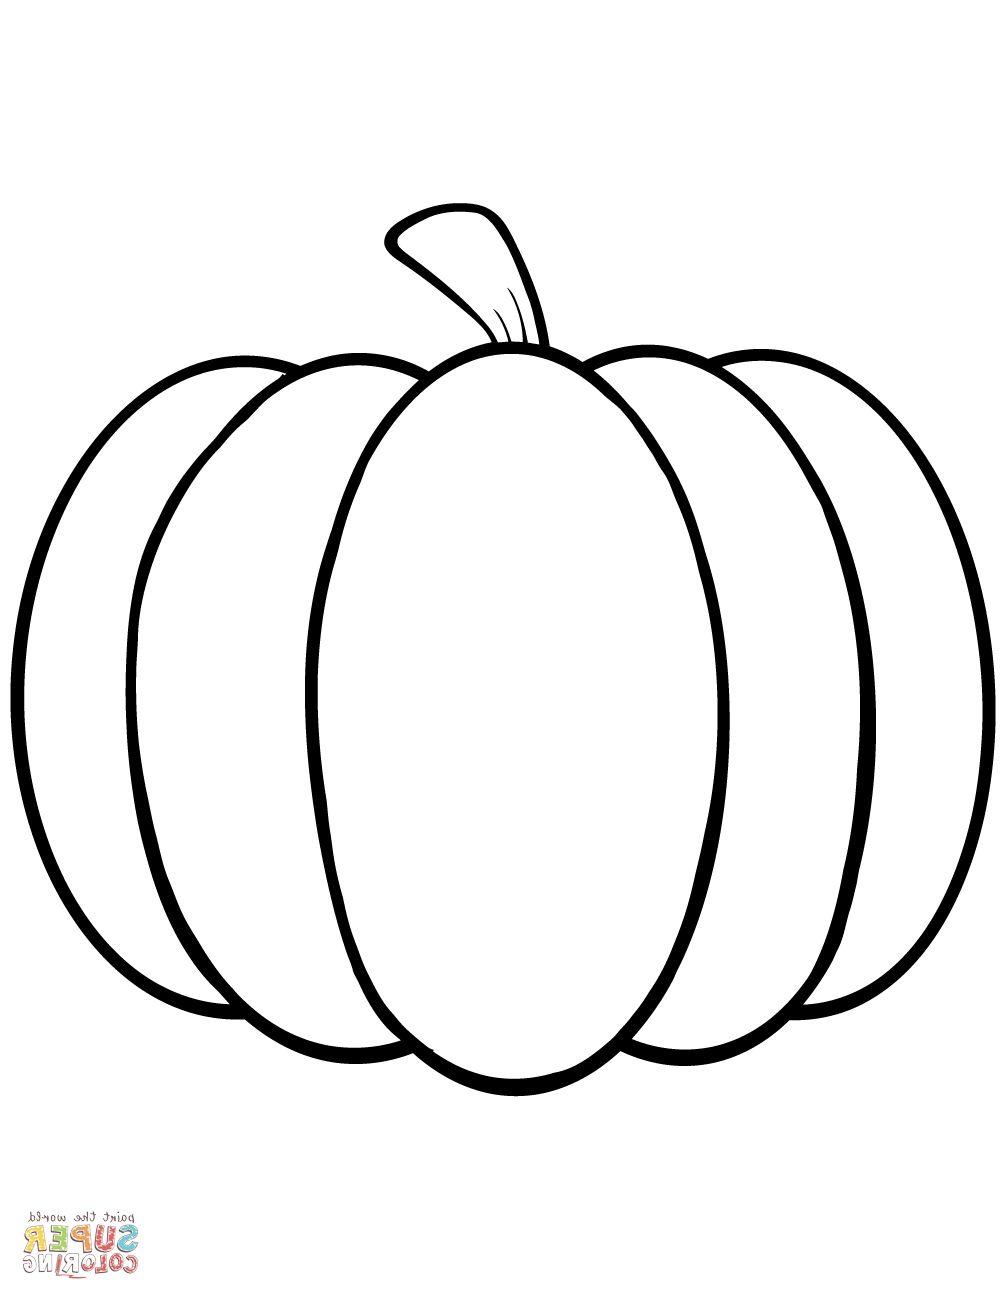 Pumpkin Coloring Pages   Coloring Page   Pumpkin Coloring